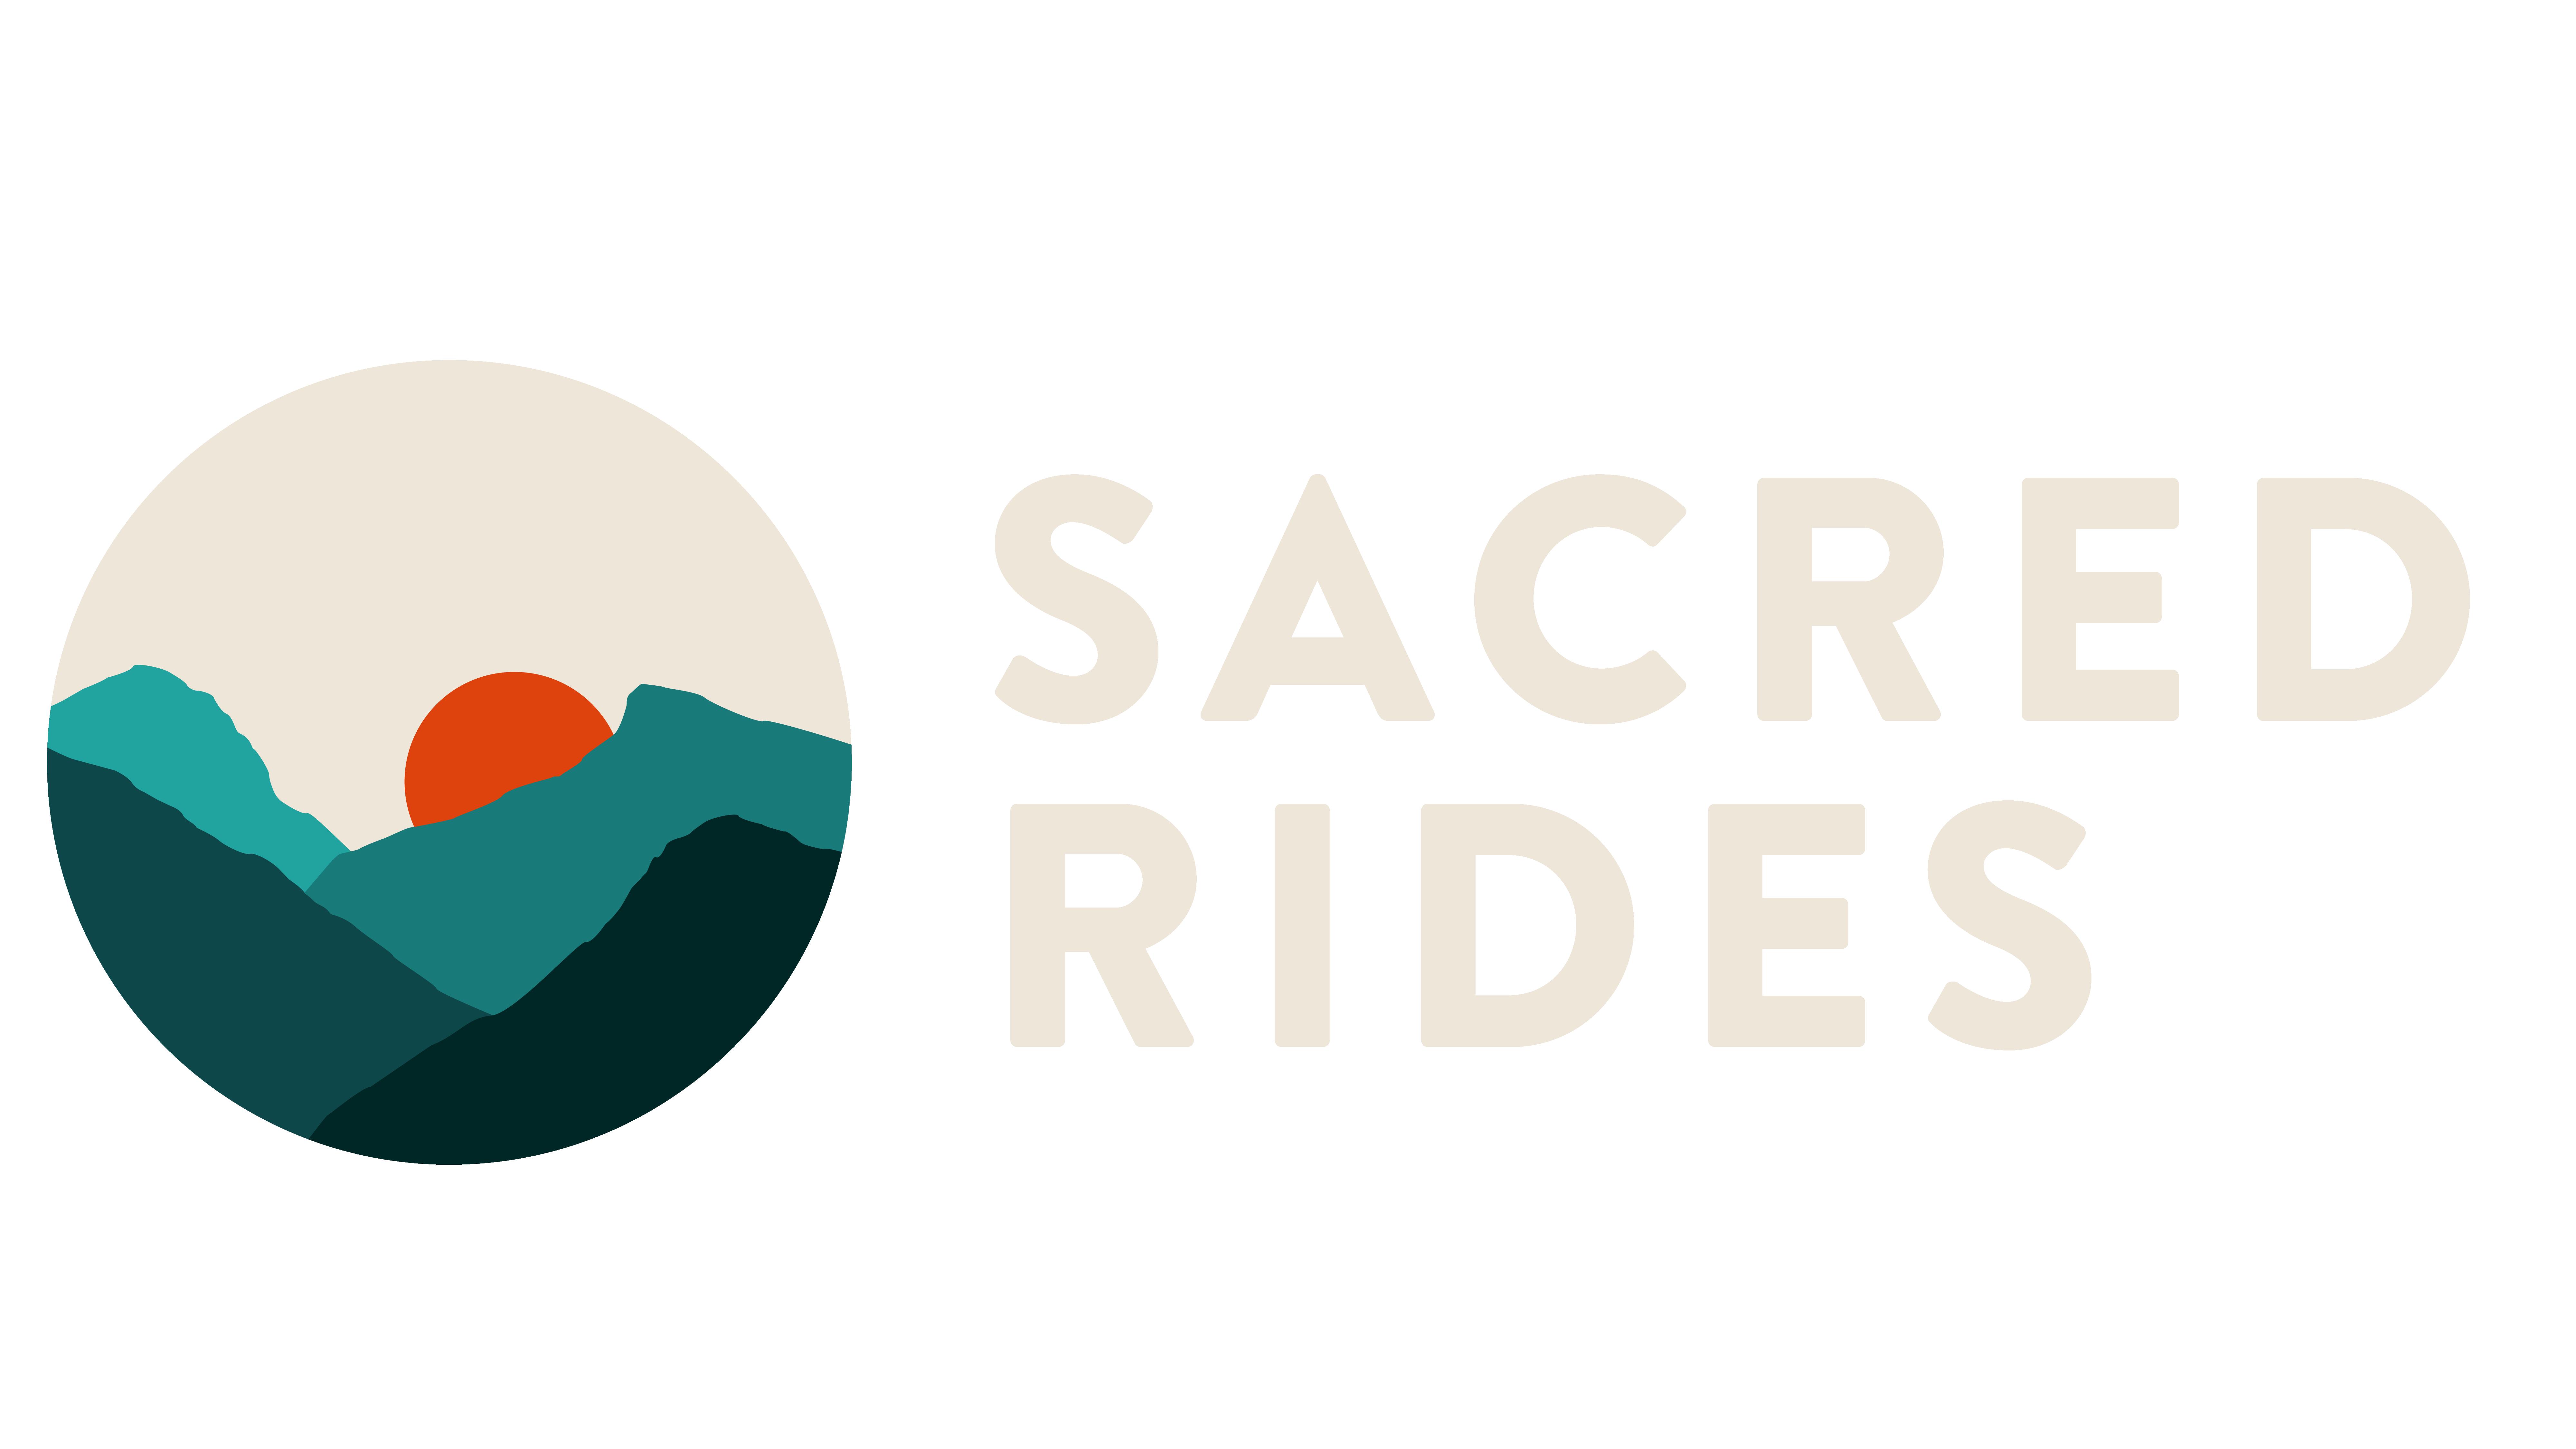 Sacred Rides